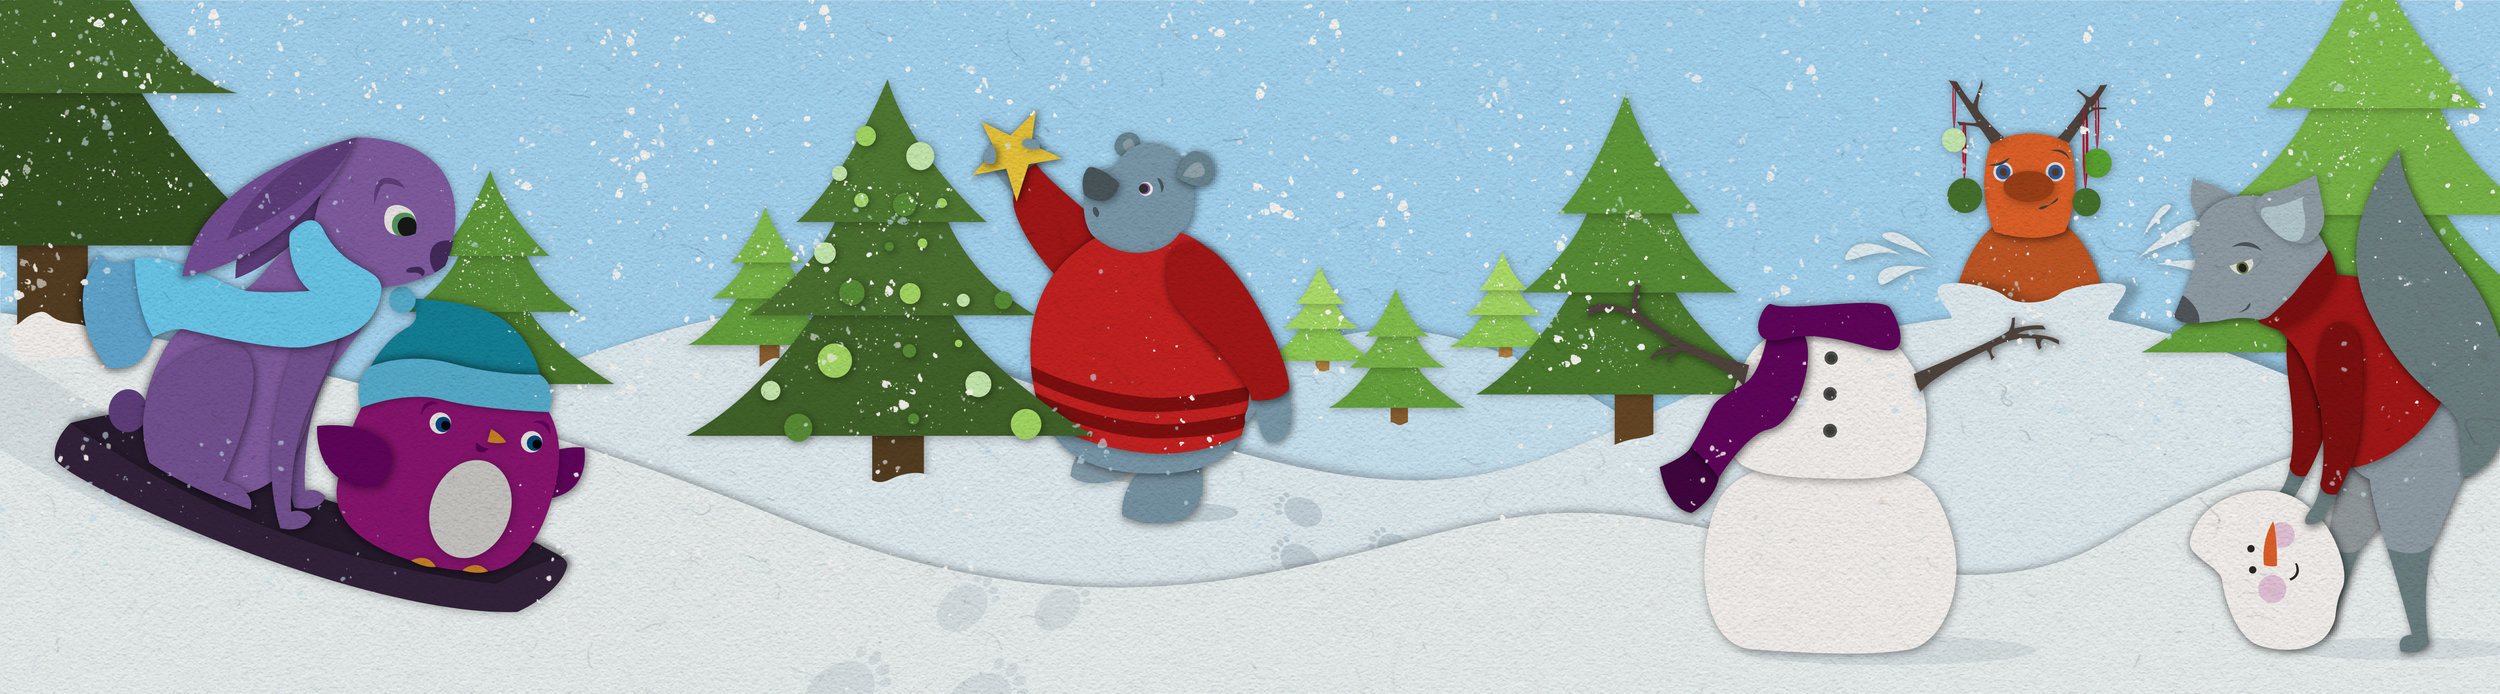 CHRISTMAS-01.jpg